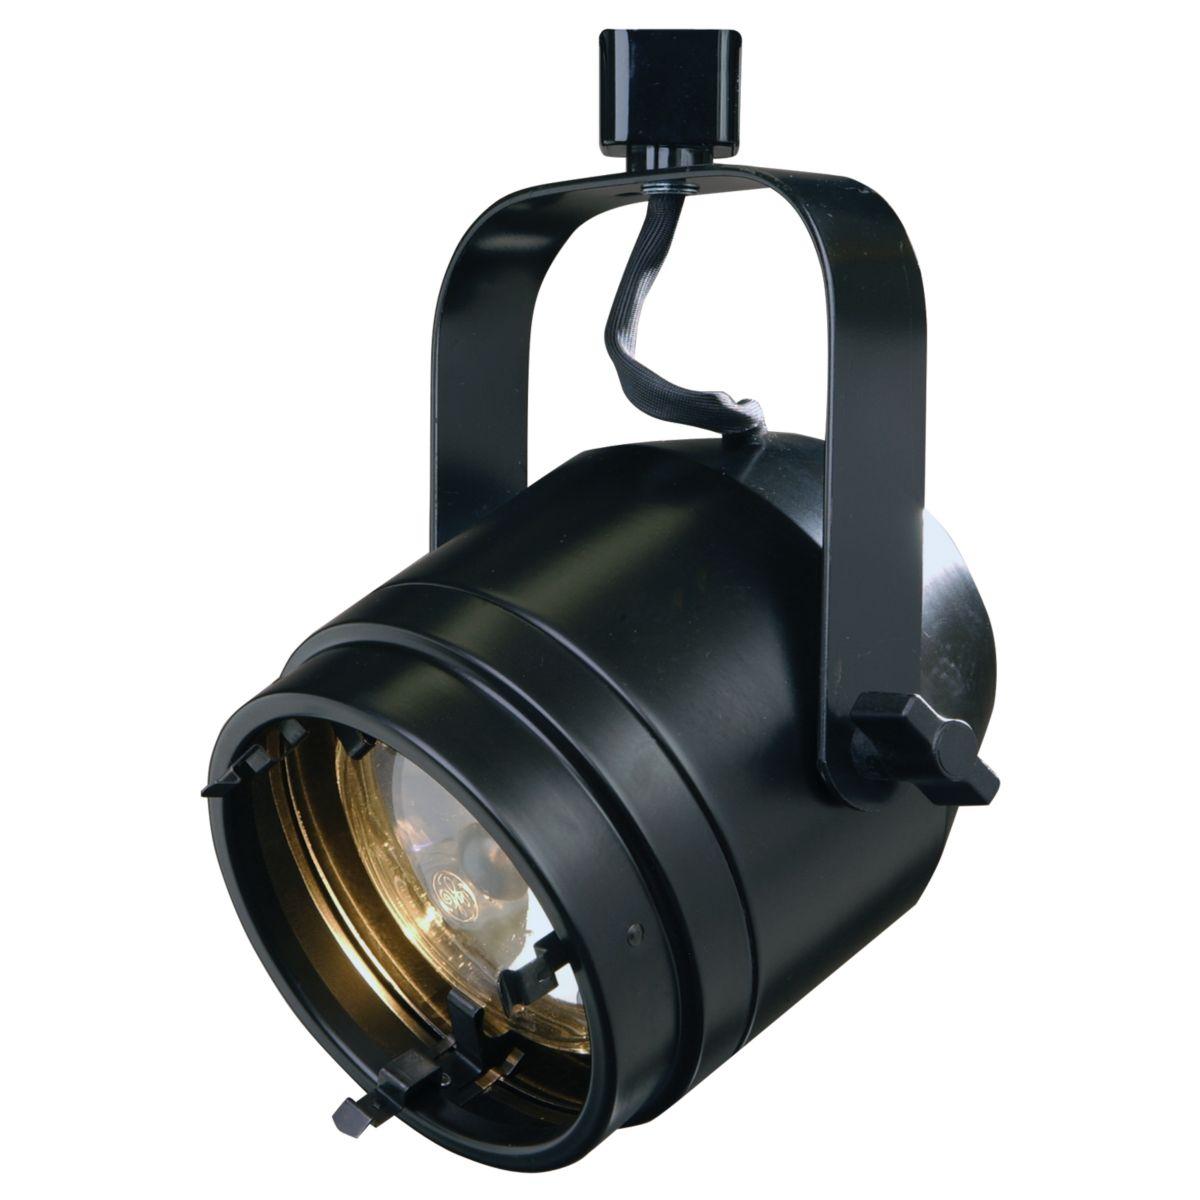 L3751 LV Alto High Intensity Display Lampholder